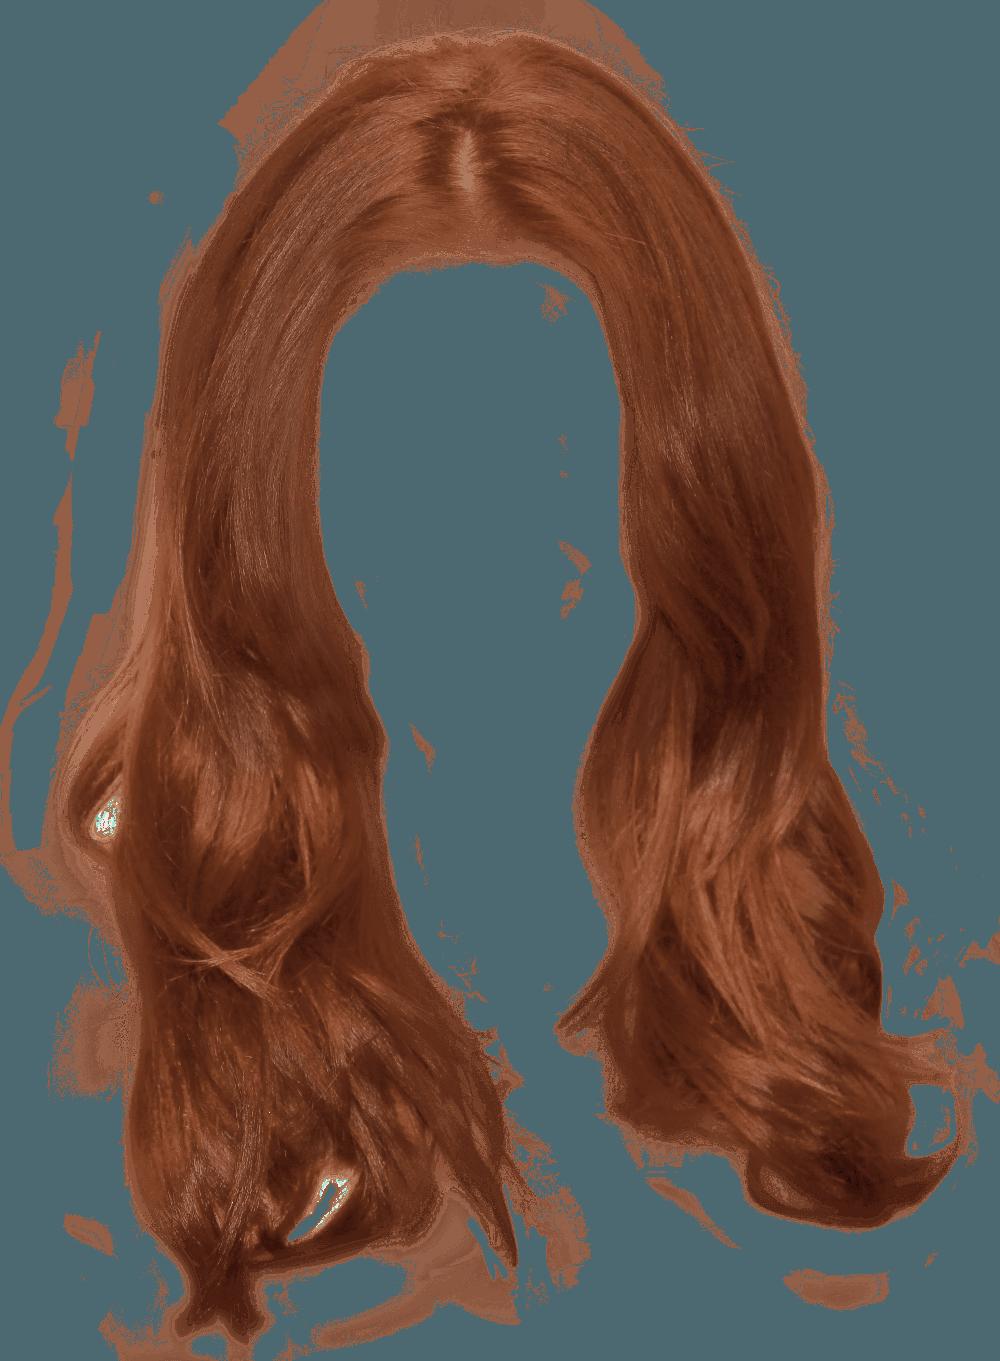 Ginger Long Women Hair transparent PNG - StickPNG